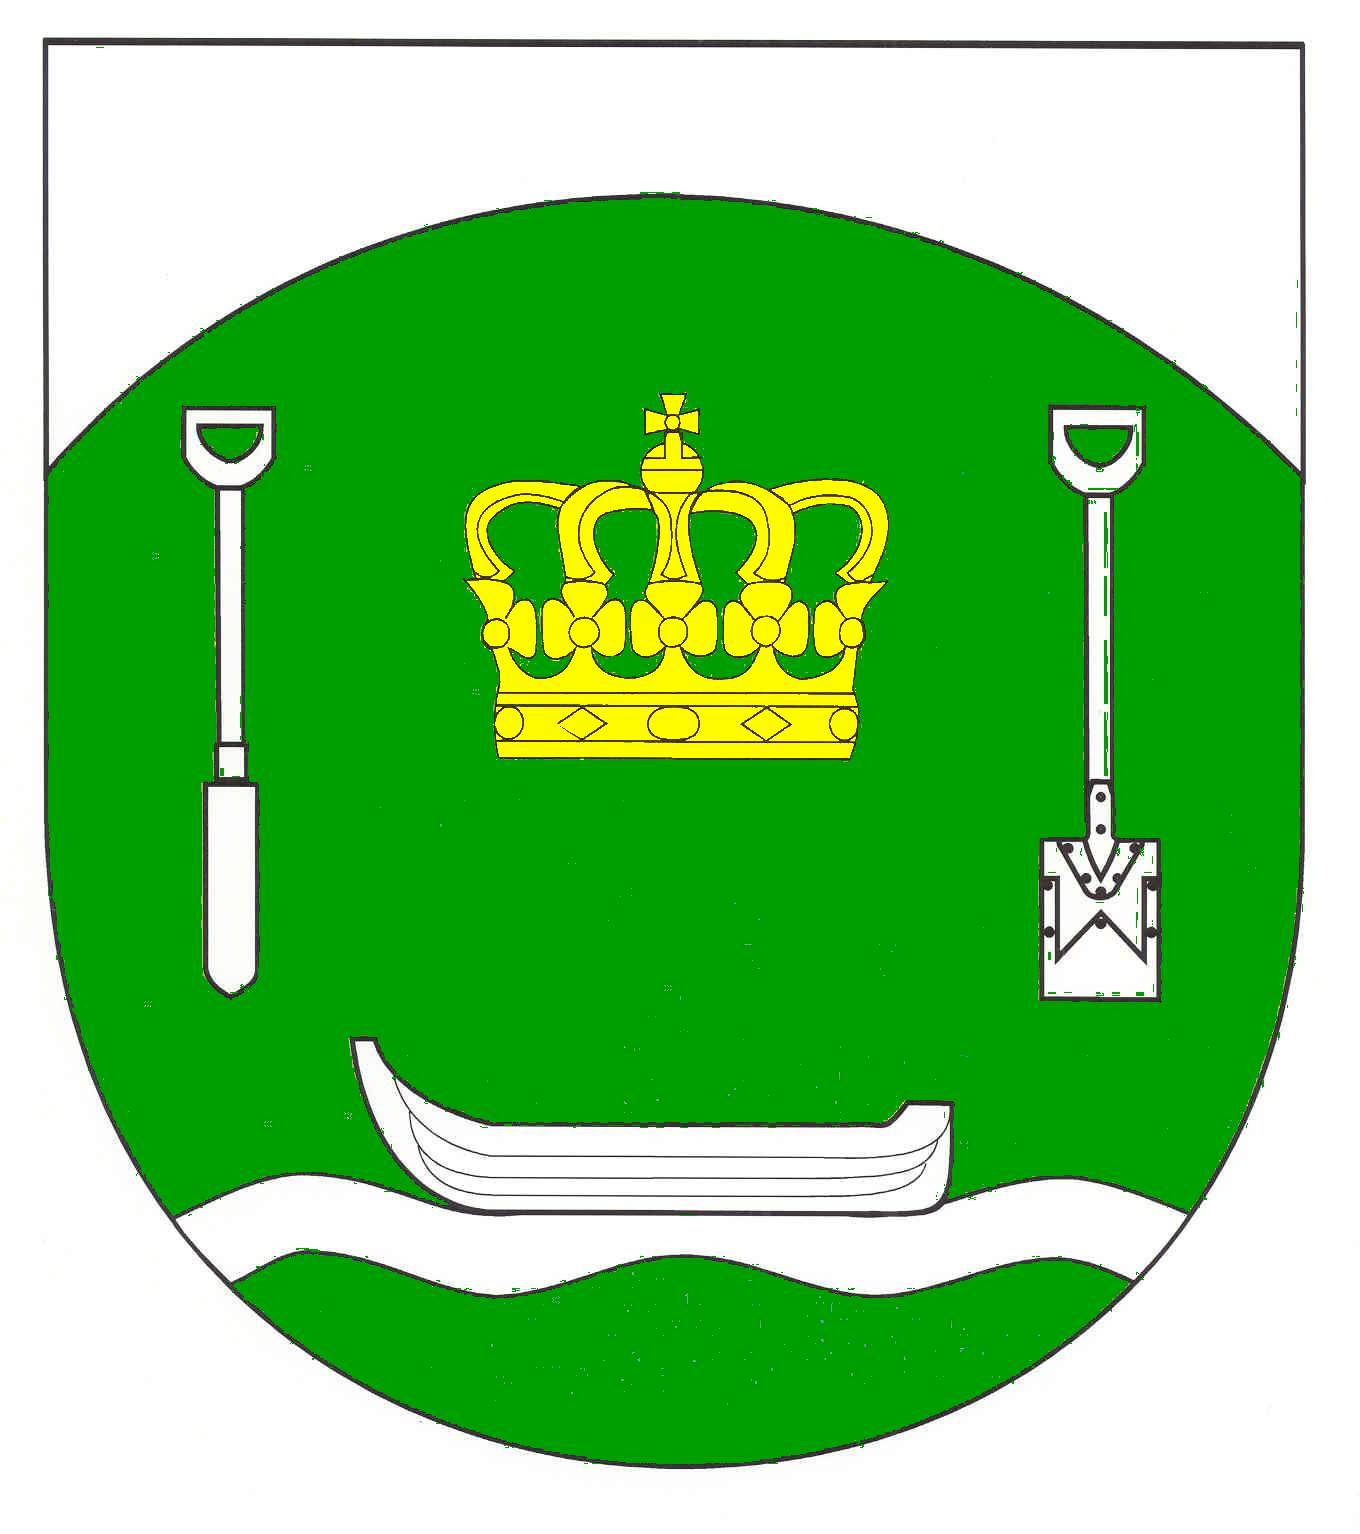 Wappen GemeindeKönigshügel, Kreis Rendsburg-Eckernförde